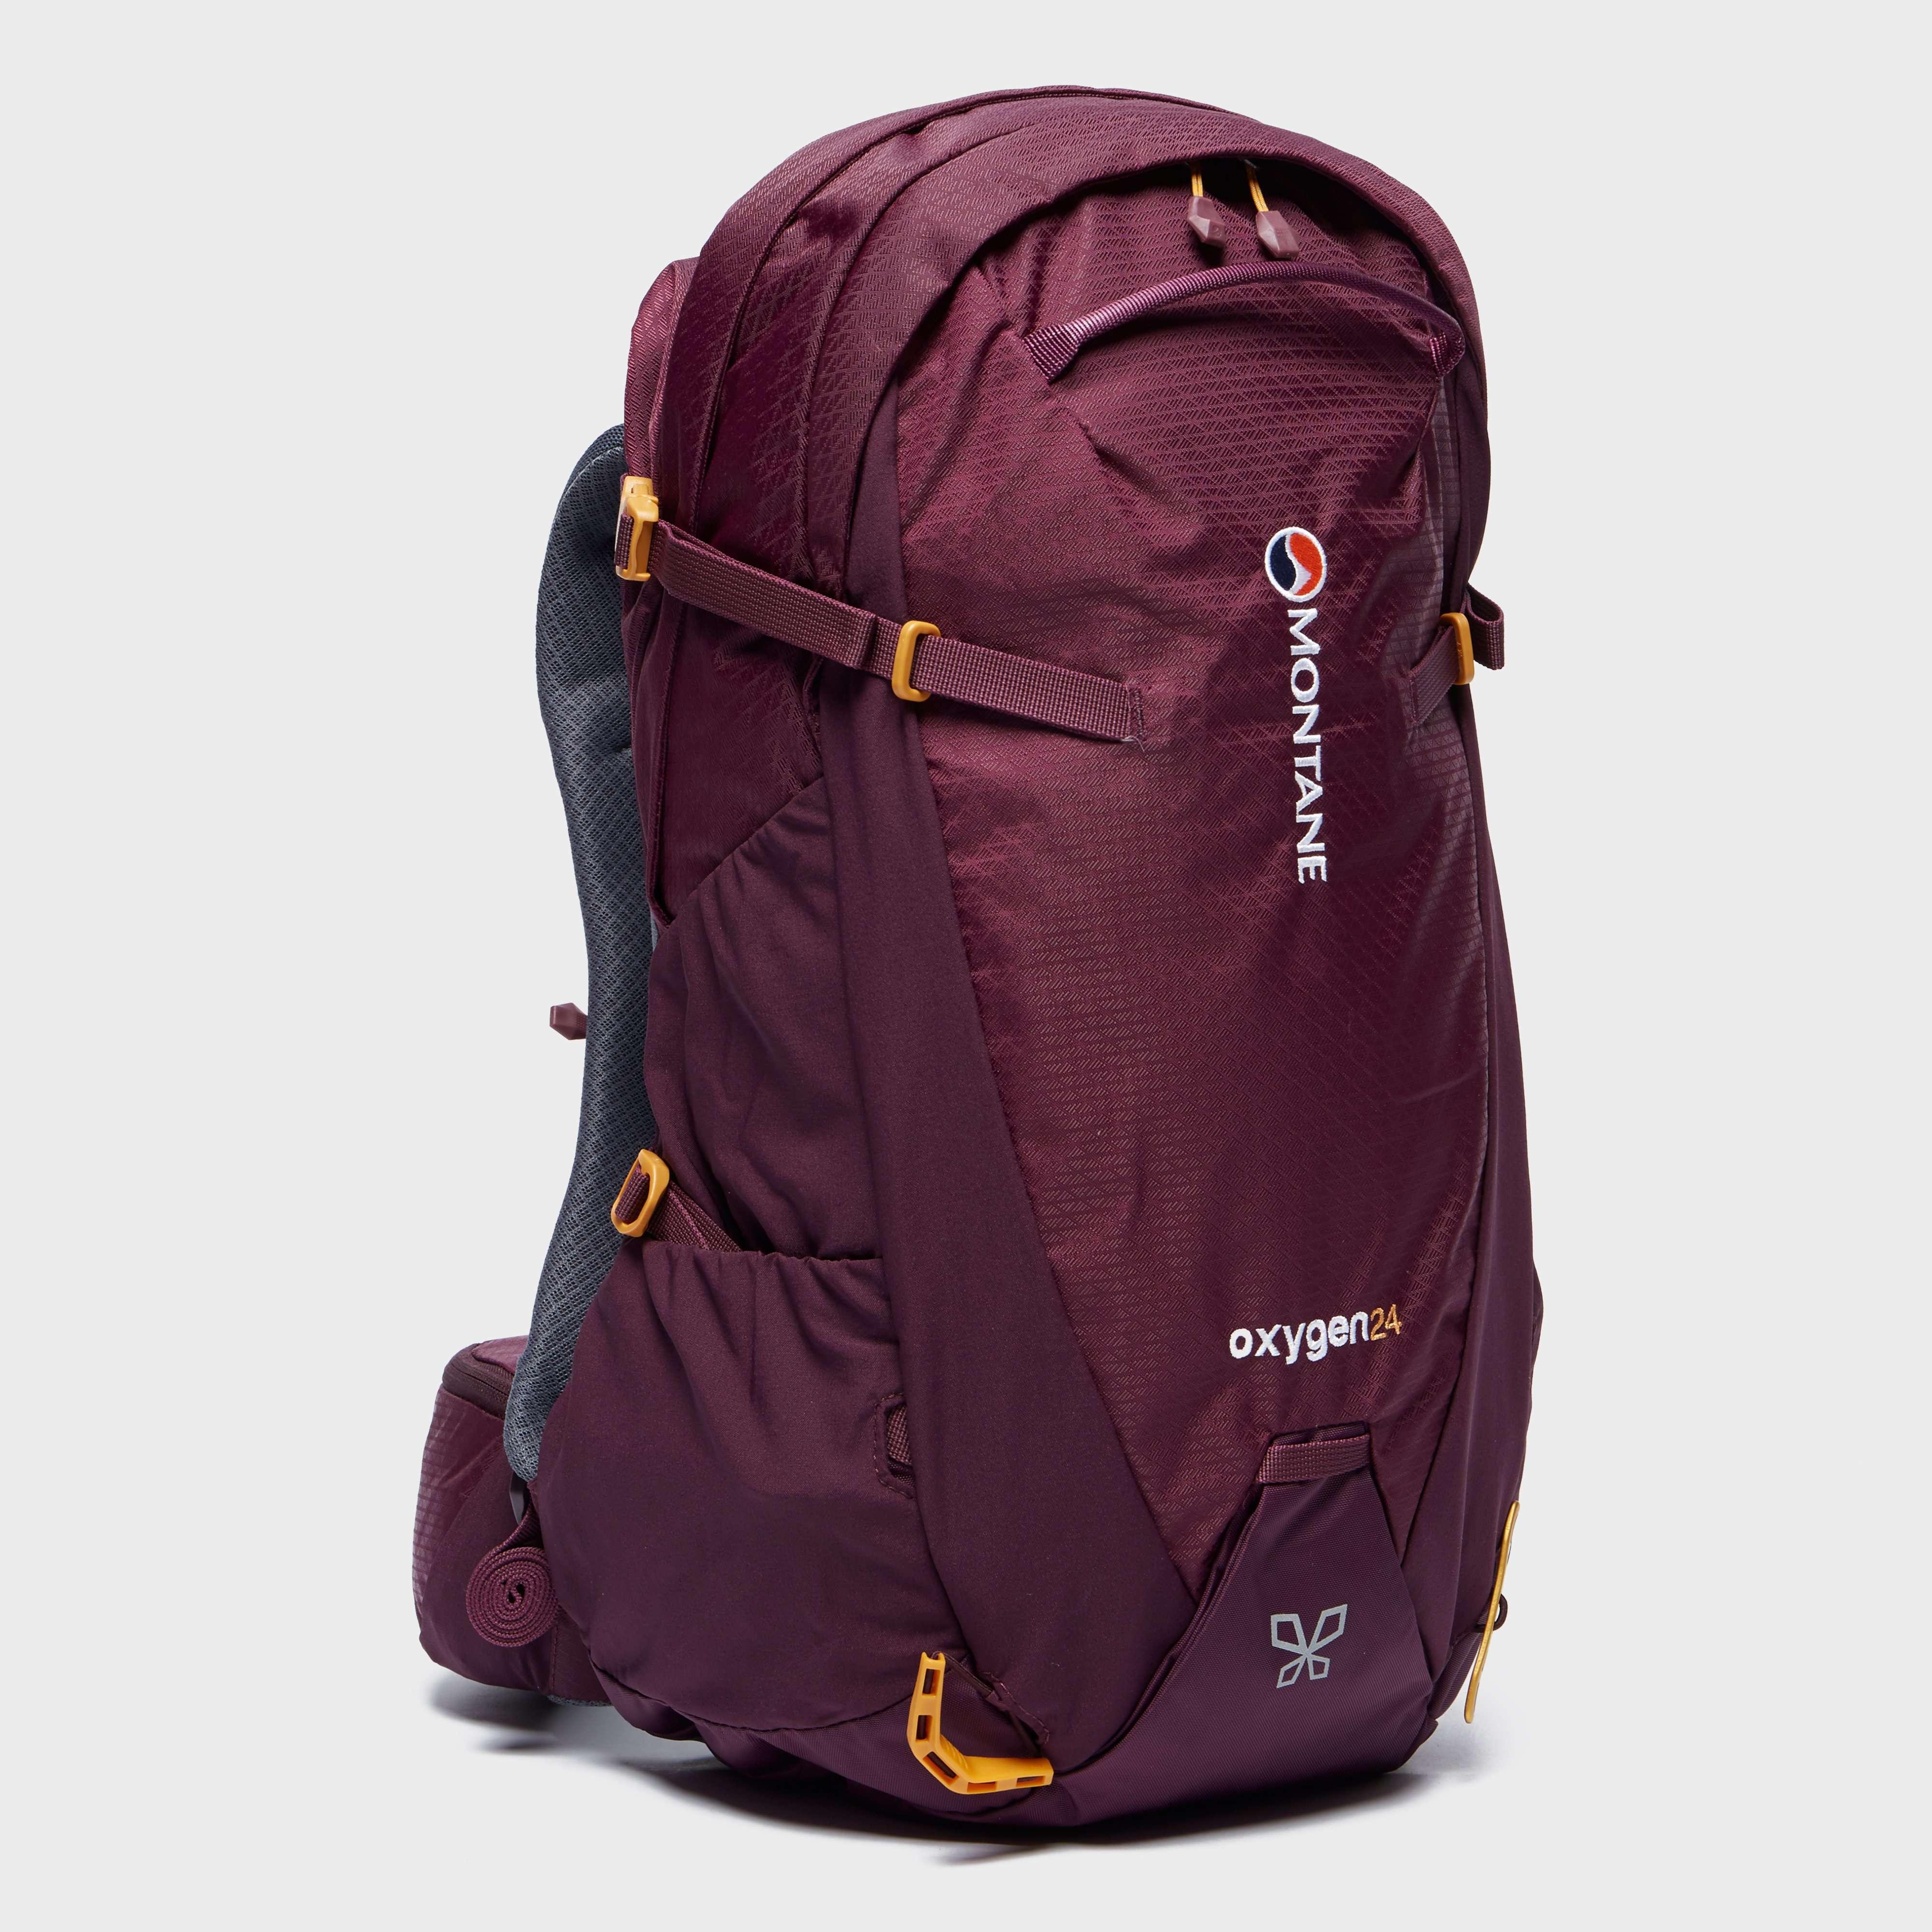 MONTANE Women's Oxygen 24 Daypack